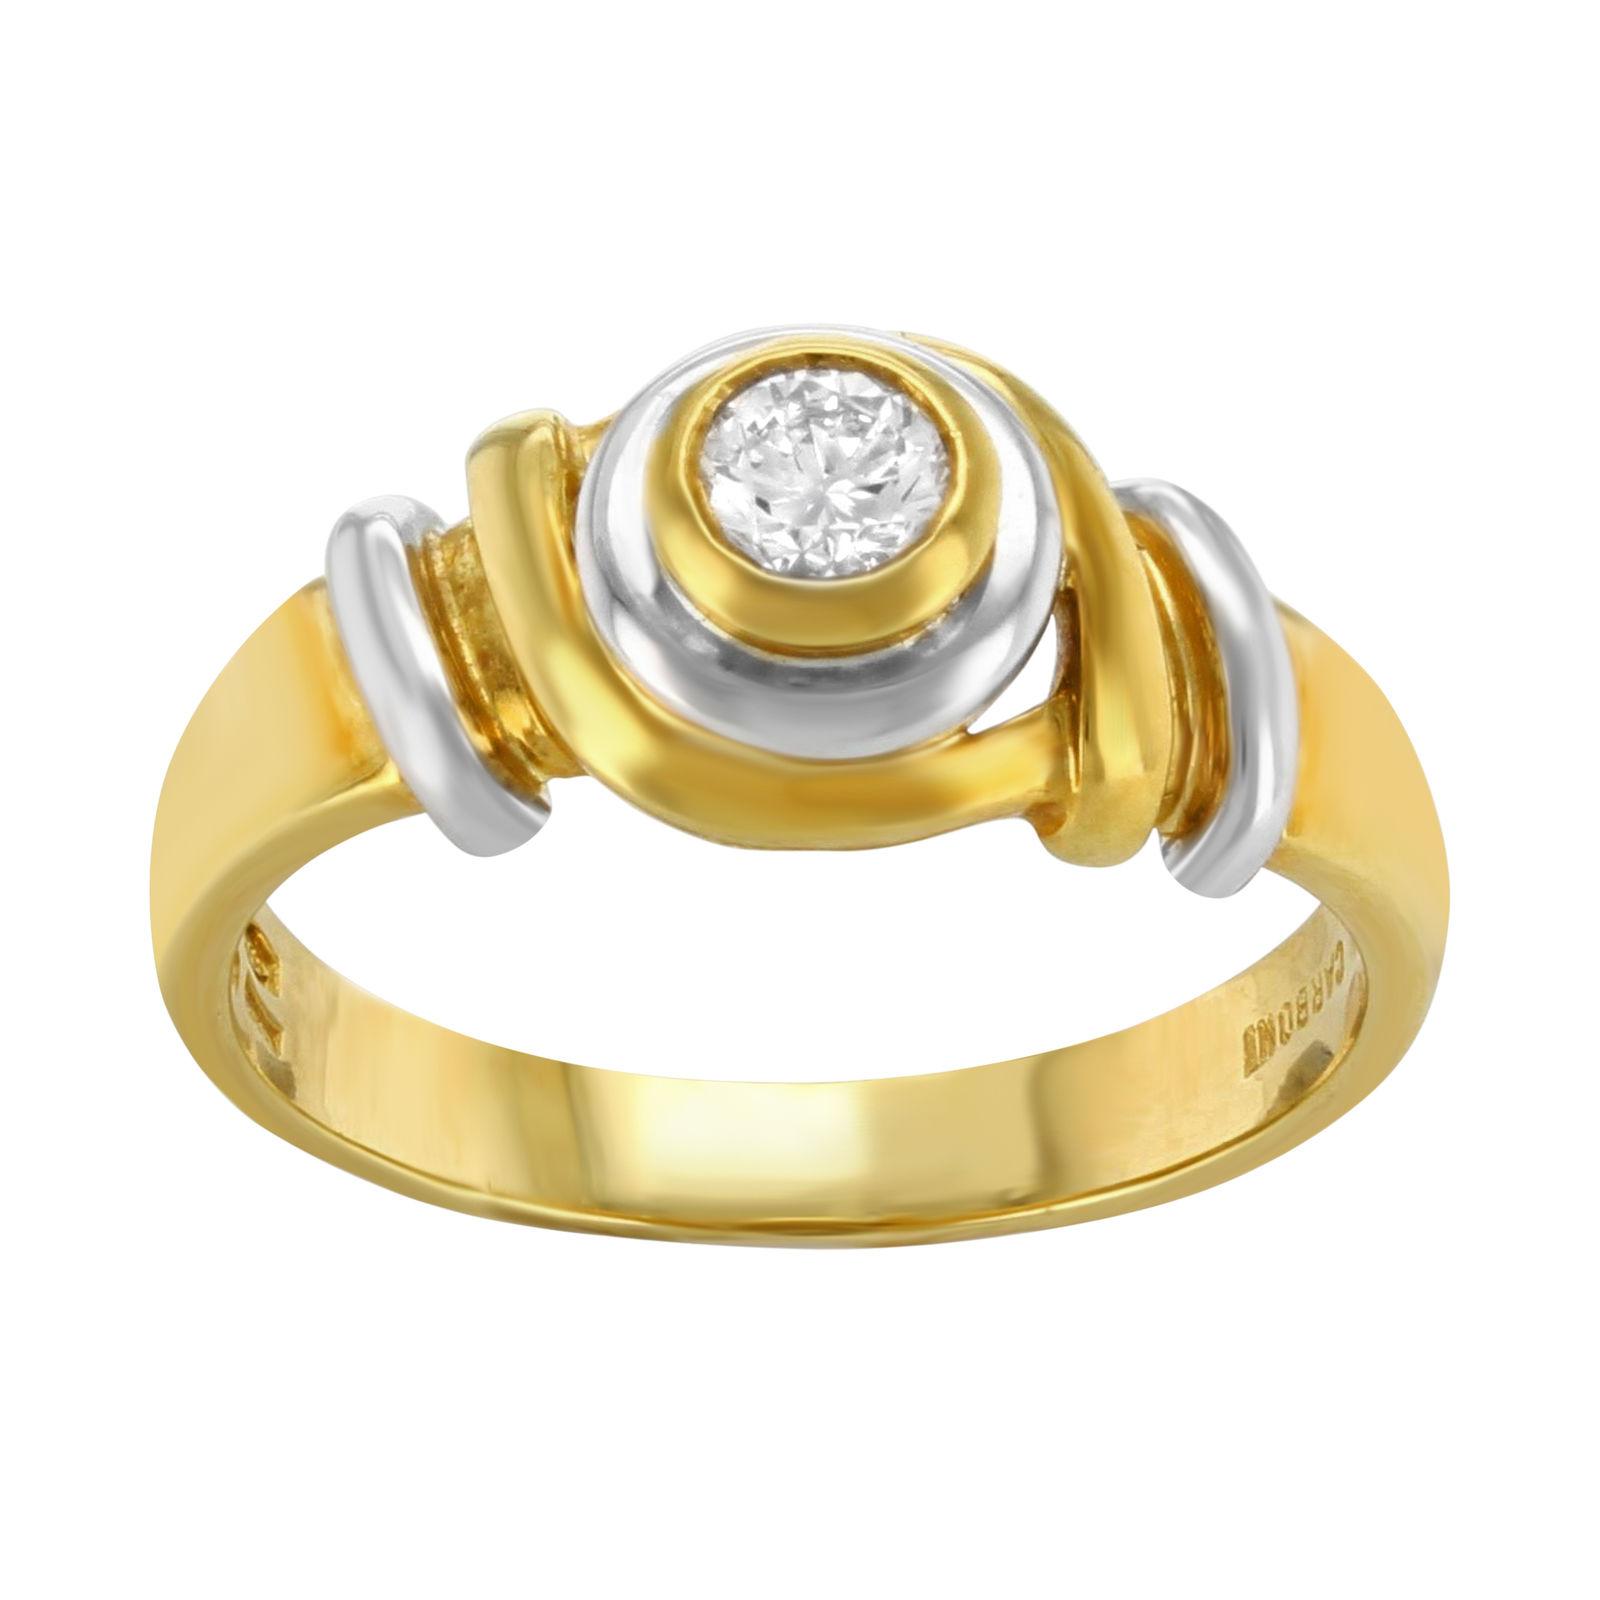 "Image of ""Salvini 18K Yellow & White Gold 0.19ct Diamond Ring Size 8.0"""